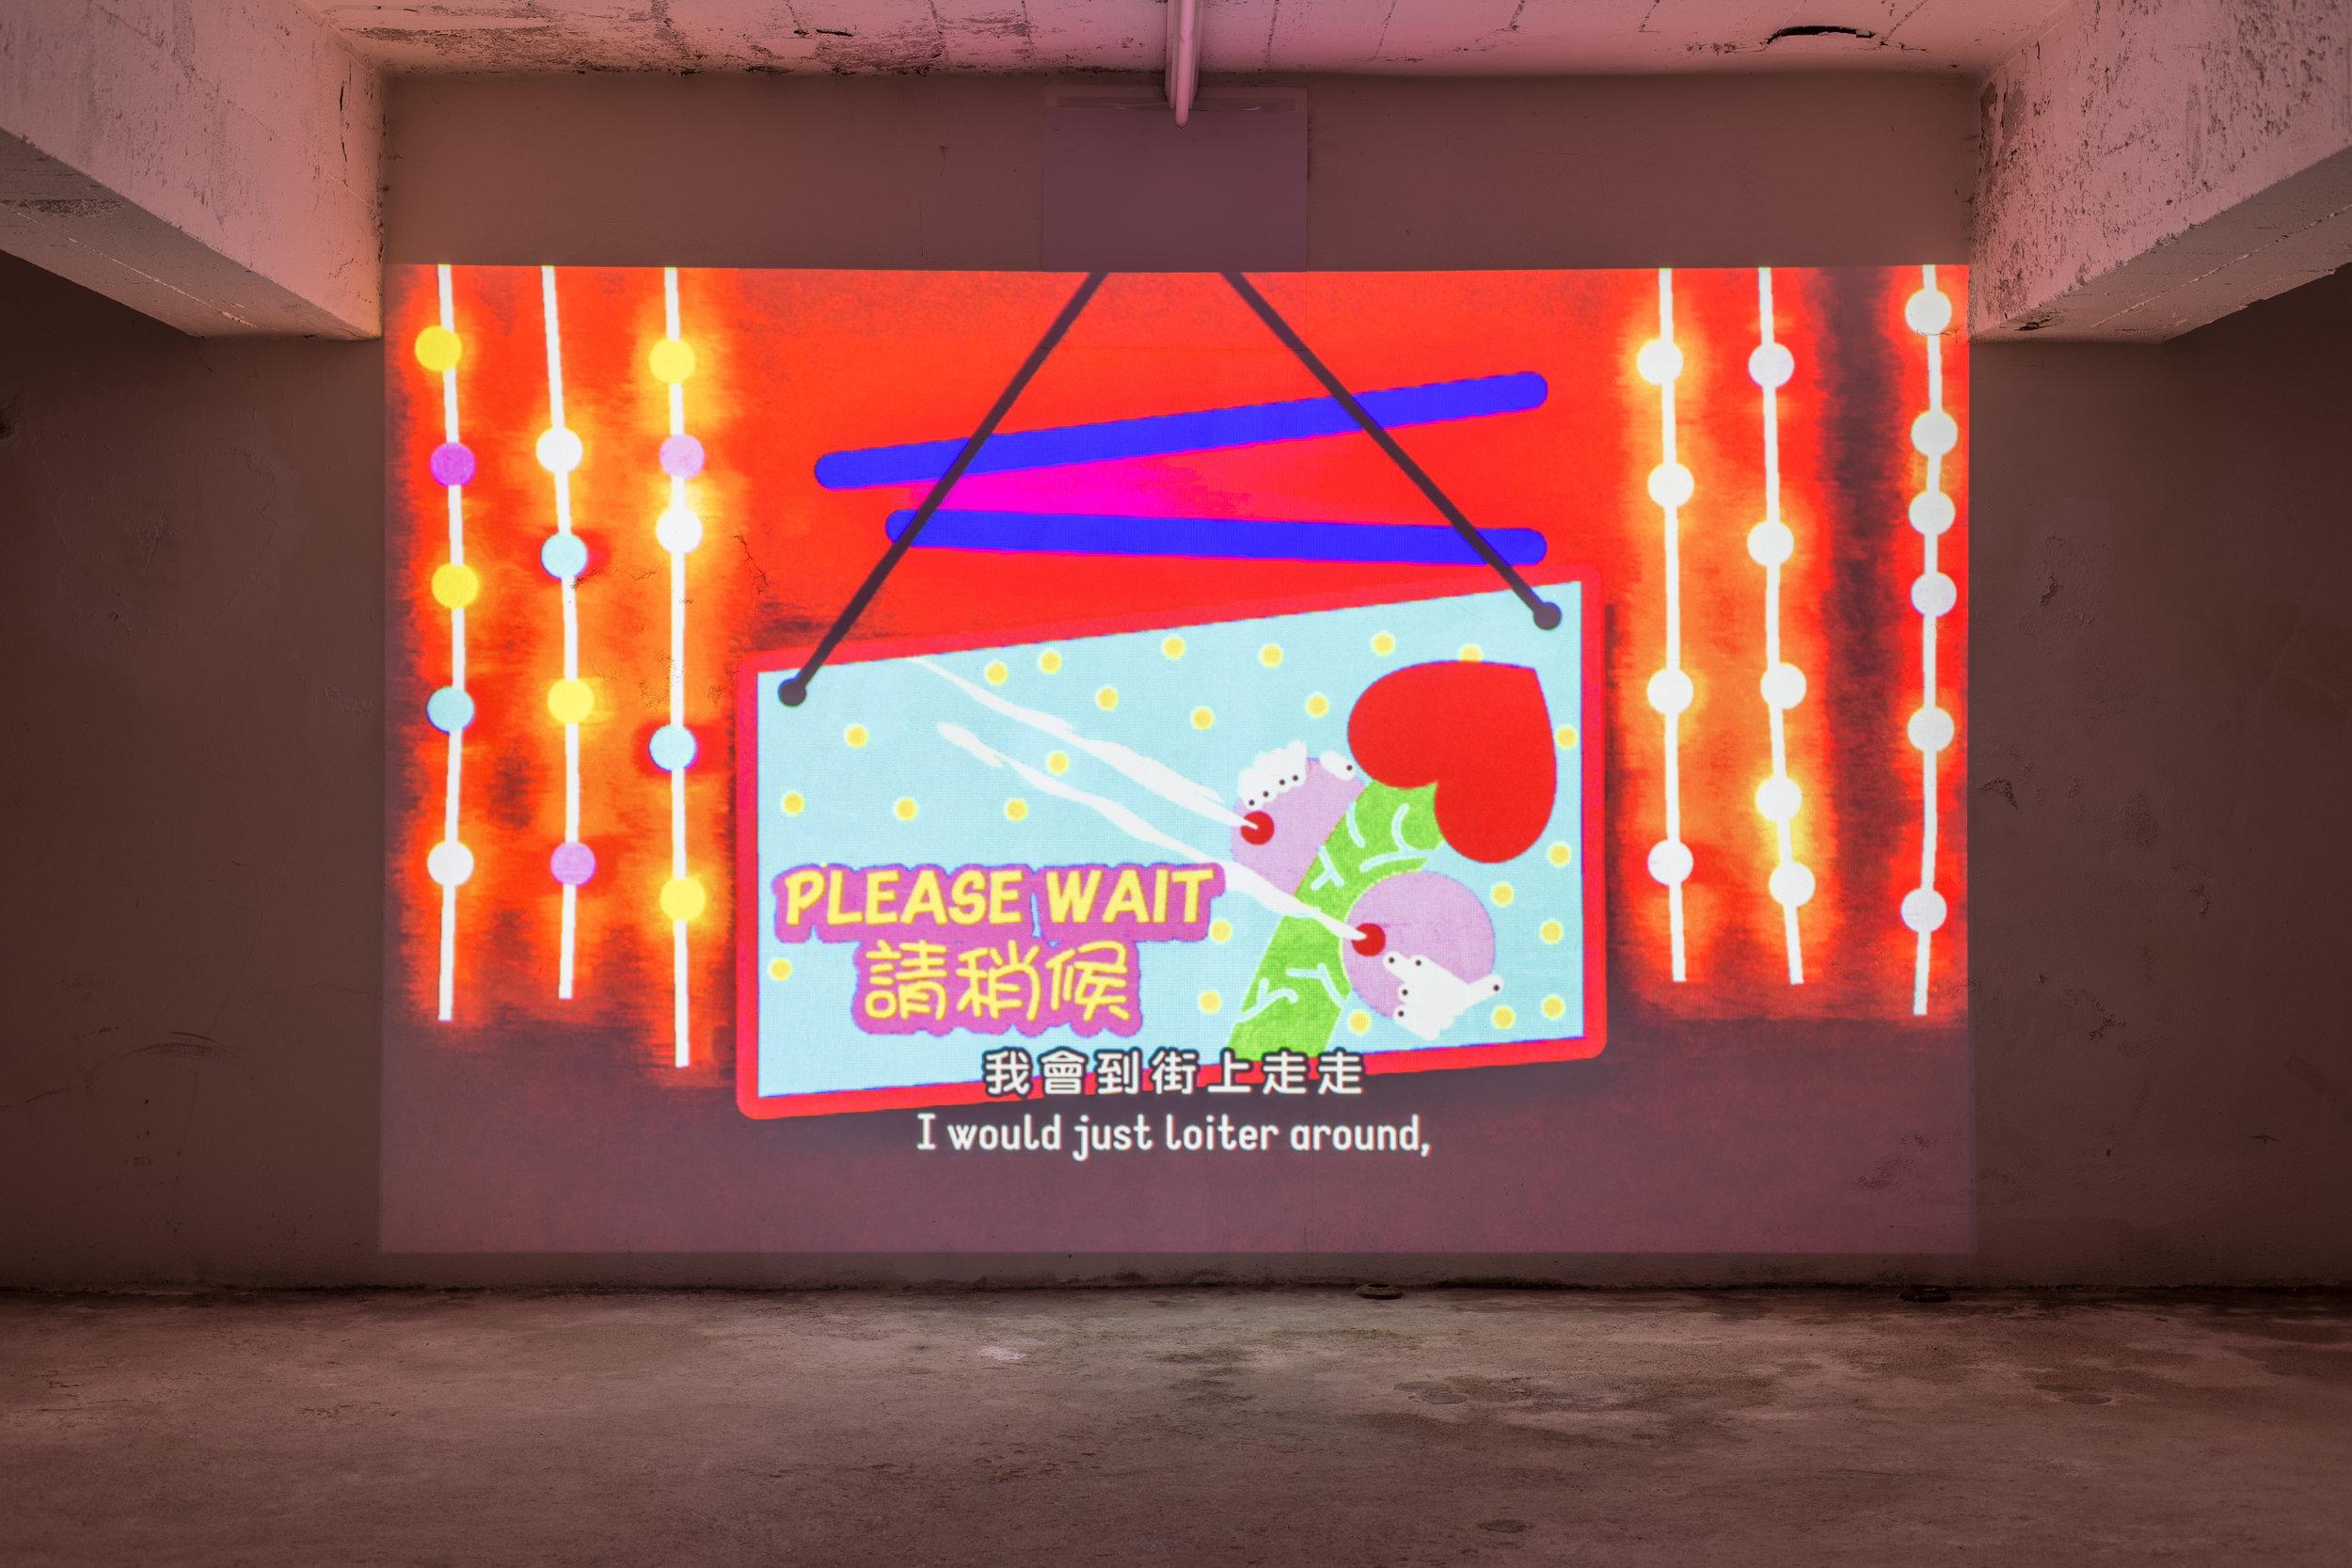 Installation view, 5. Donatella Bernardi & Wong Ping Wong Ping,  Jungle of Desire, 2015, single channel video animation, 6min50sec. Photo: Kilian Bannwart